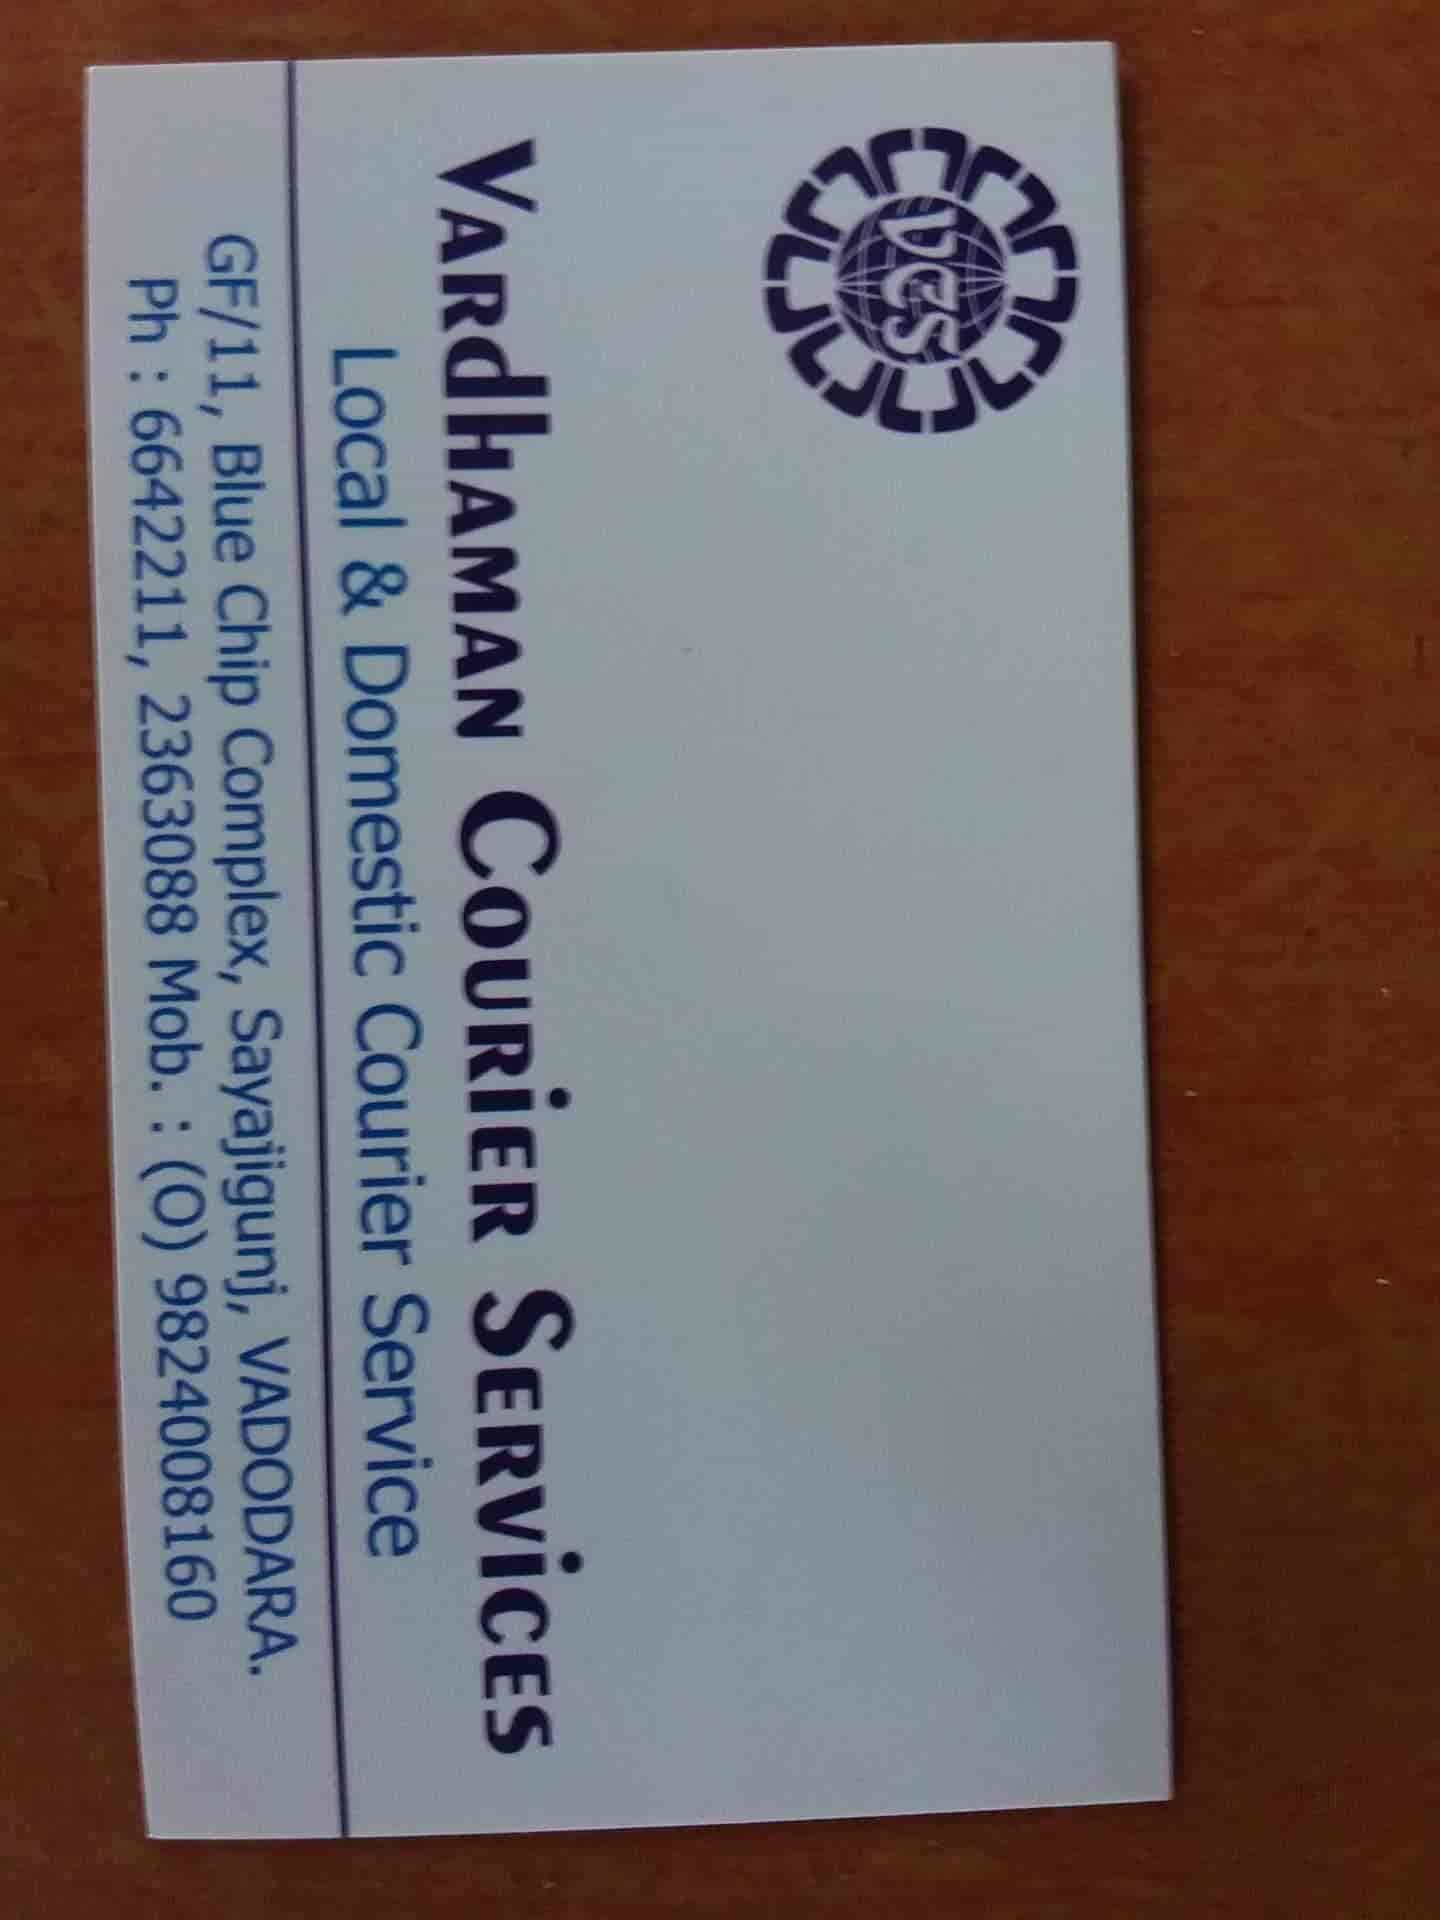 Vardhman Courier Services, Sayaji Ganj - Courier Services in